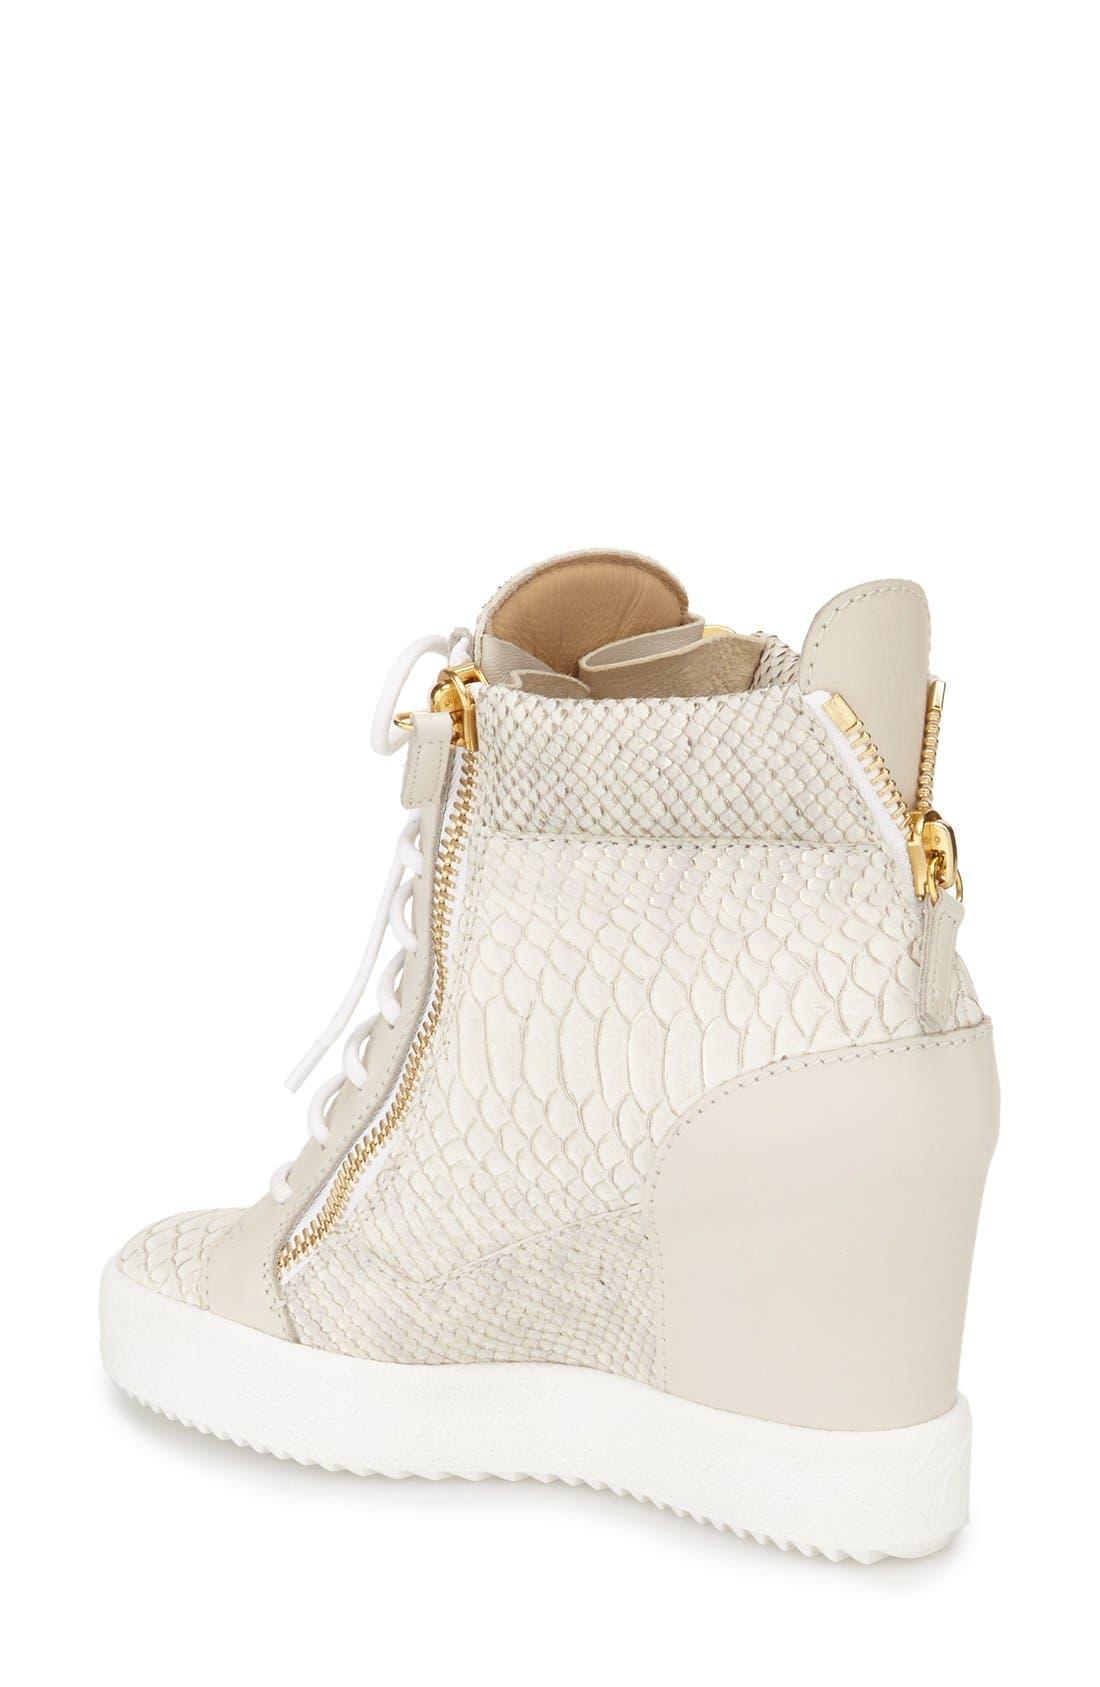 GIUSEPPE ZANOTTI,                             Ofelia Wedge Sneaker,                             Alternate thumbnail 2, color,                             040